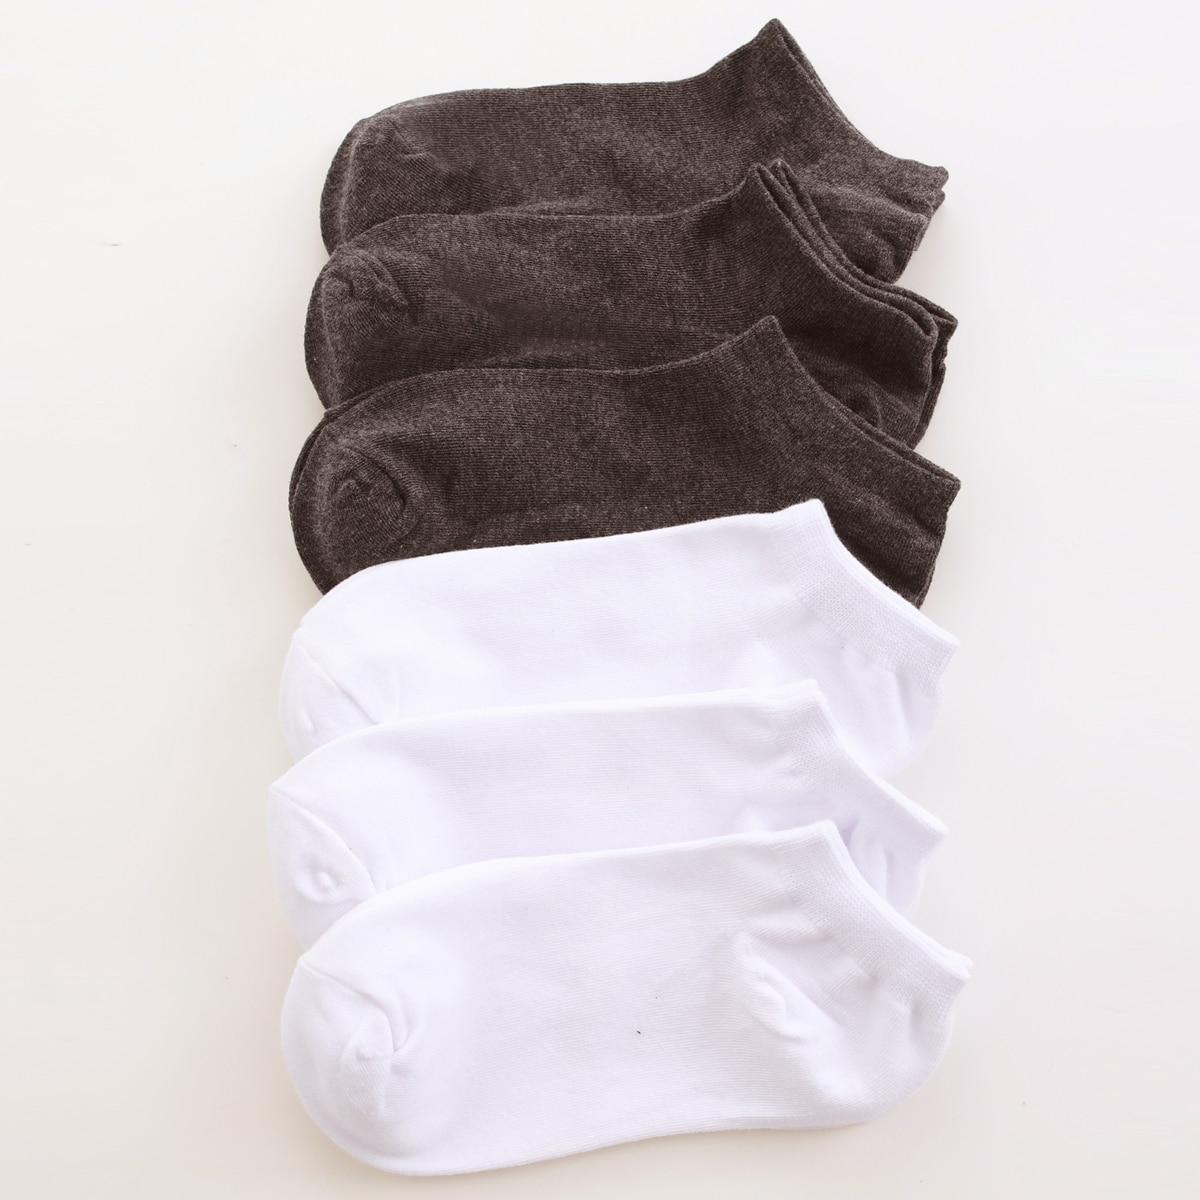 Простые носки 6 пар фото